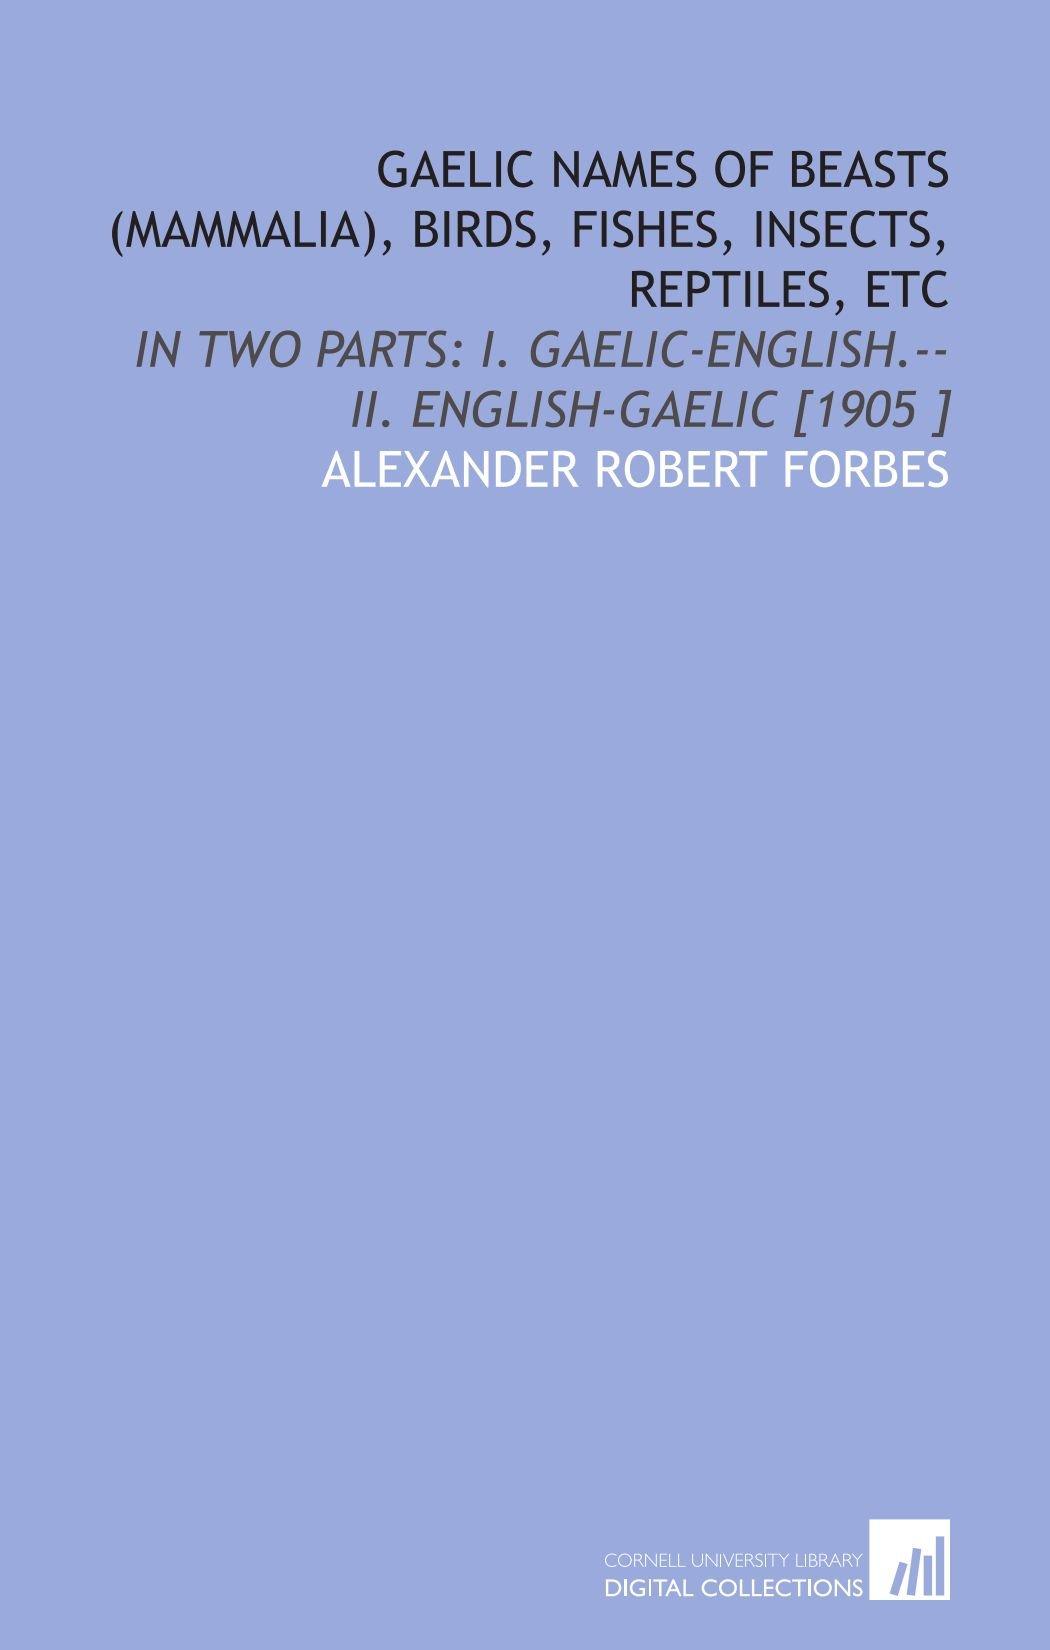 Gaelic Names of Beasts (Mammalia), Birds, Fishes, Insects, Reptiles, Etc: In Two Parts: I. Gaelic-English.--II. English-Gaelic [1905 ] PDF